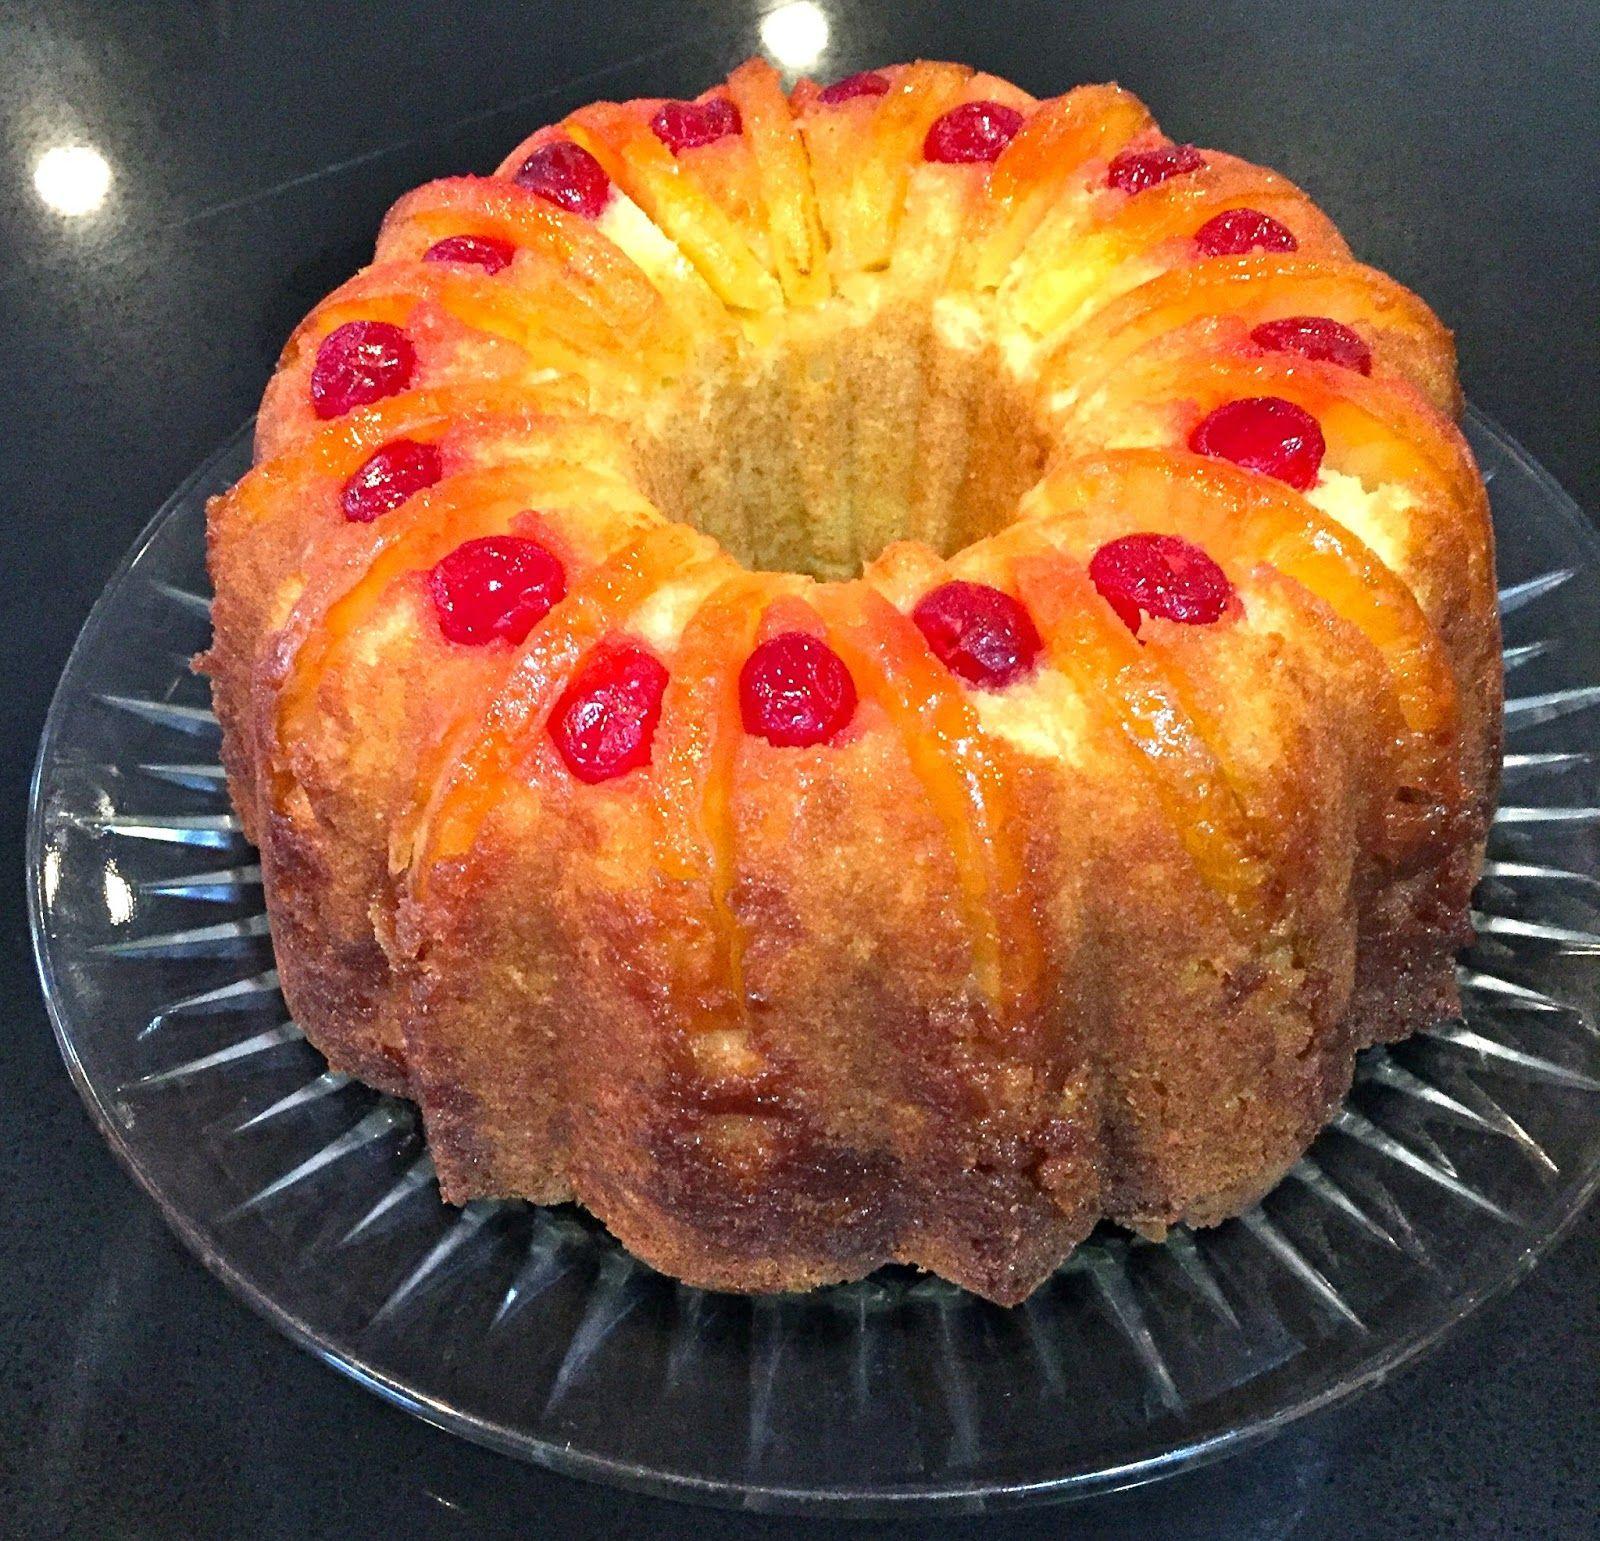 Bundt Cake Recipes From Scratch: My Mother's Apron Strings: Upside-Down Pineapple Bundt